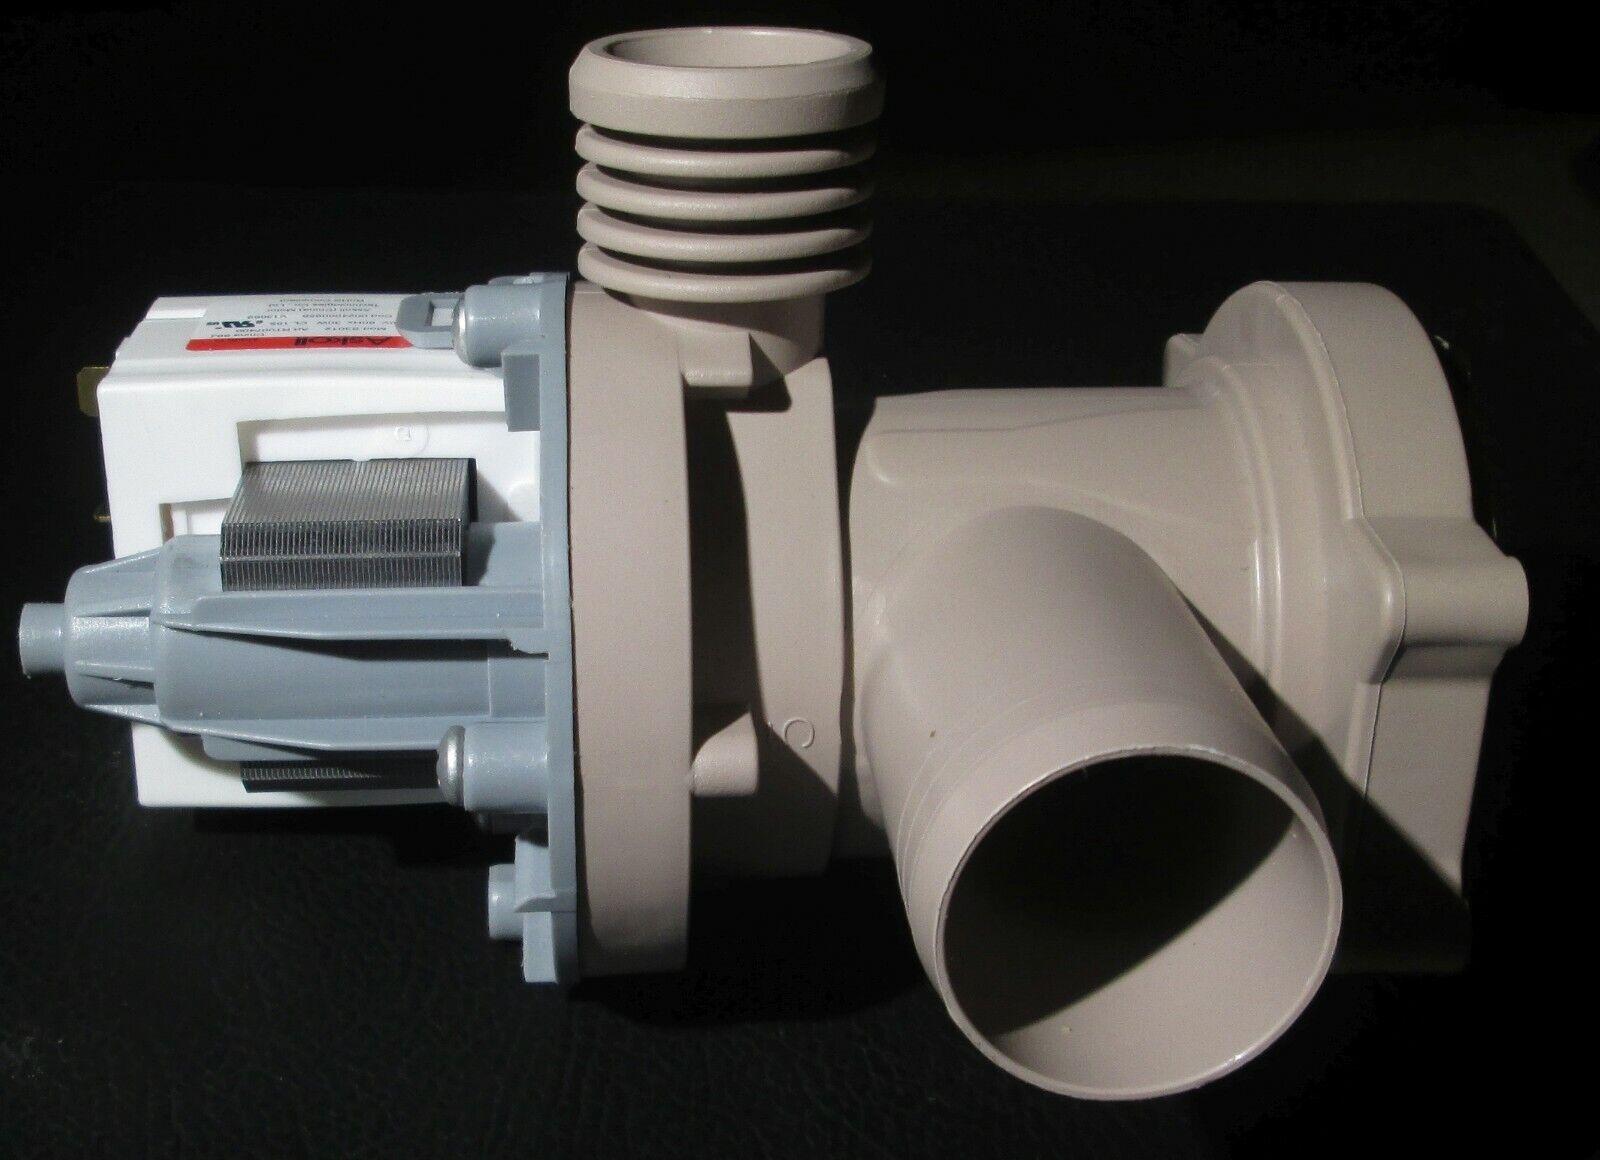 Askoll 090207 pump for Ariston, Splendide or Westland Washer